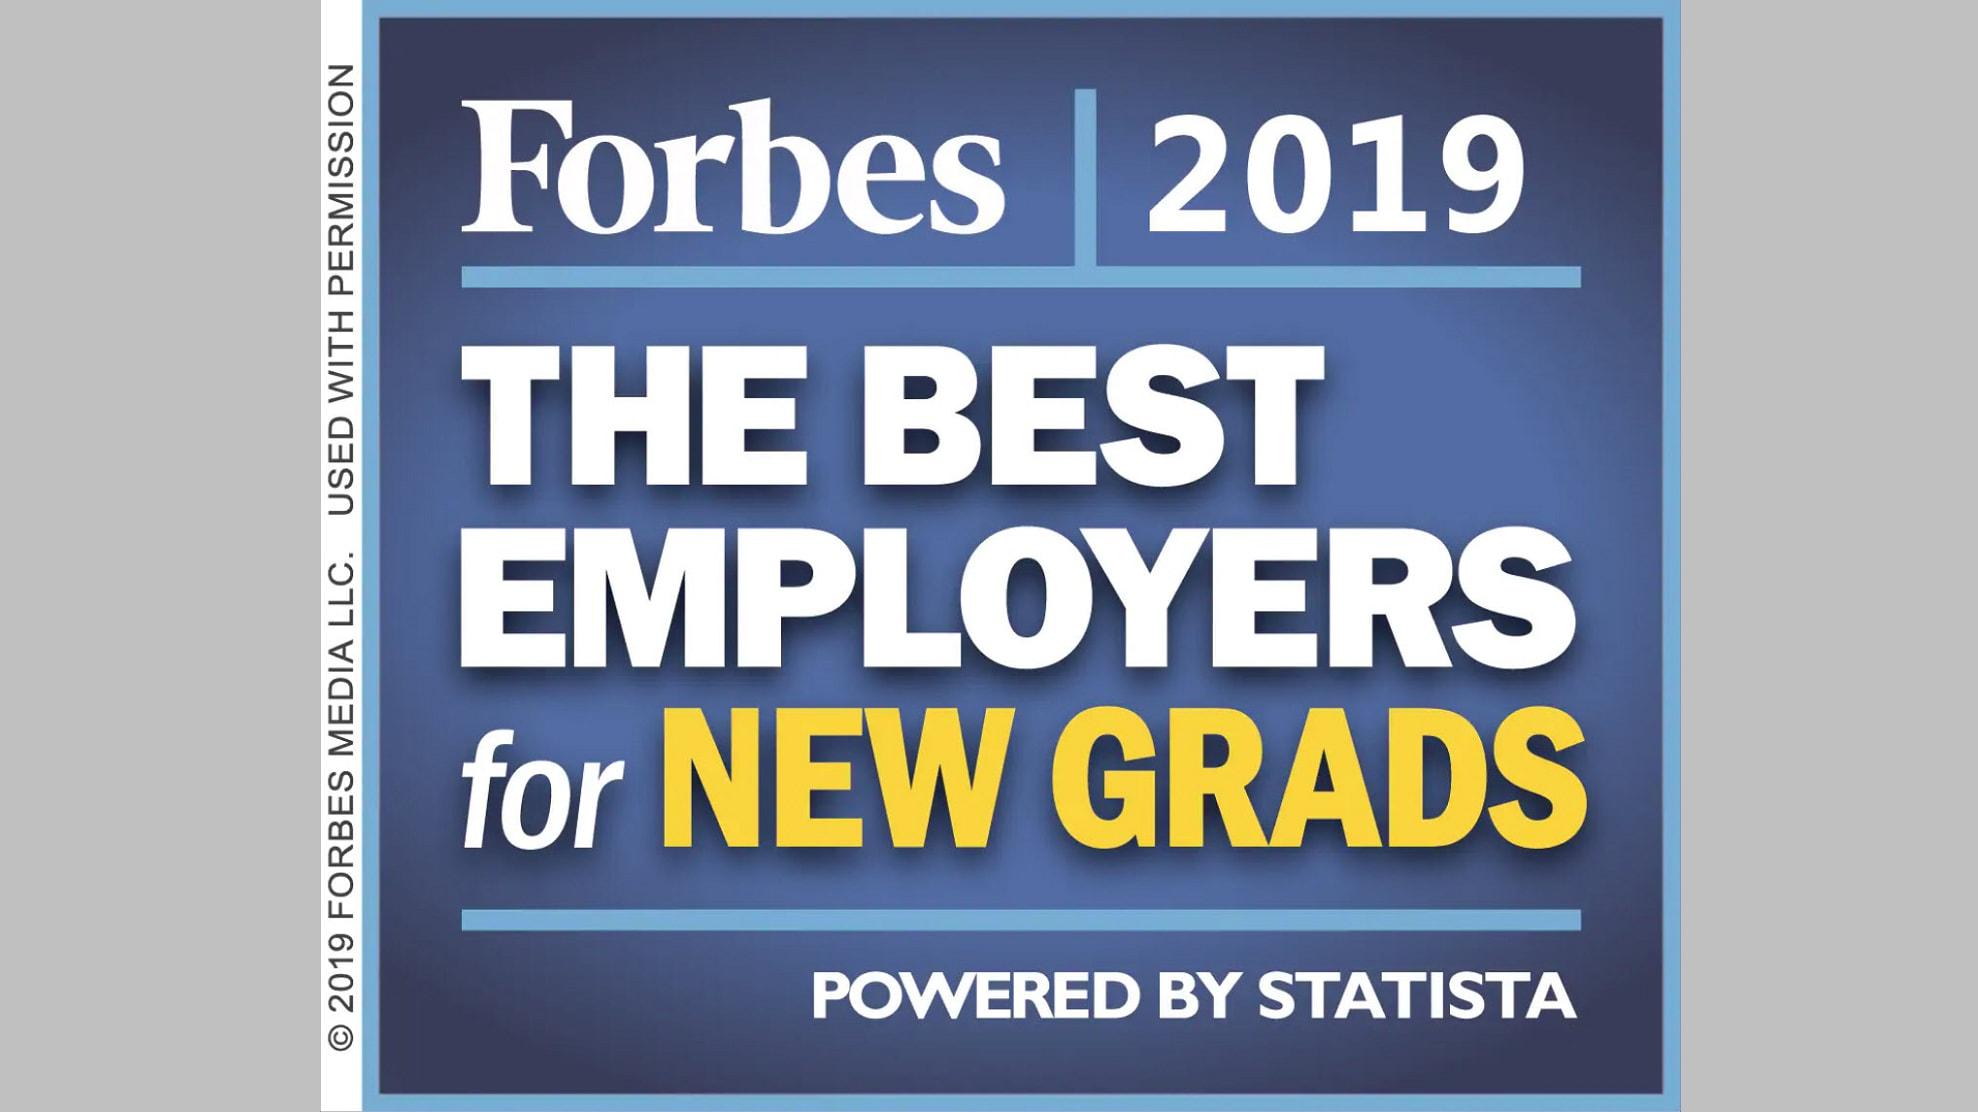 Forbes New Graduates Award Image